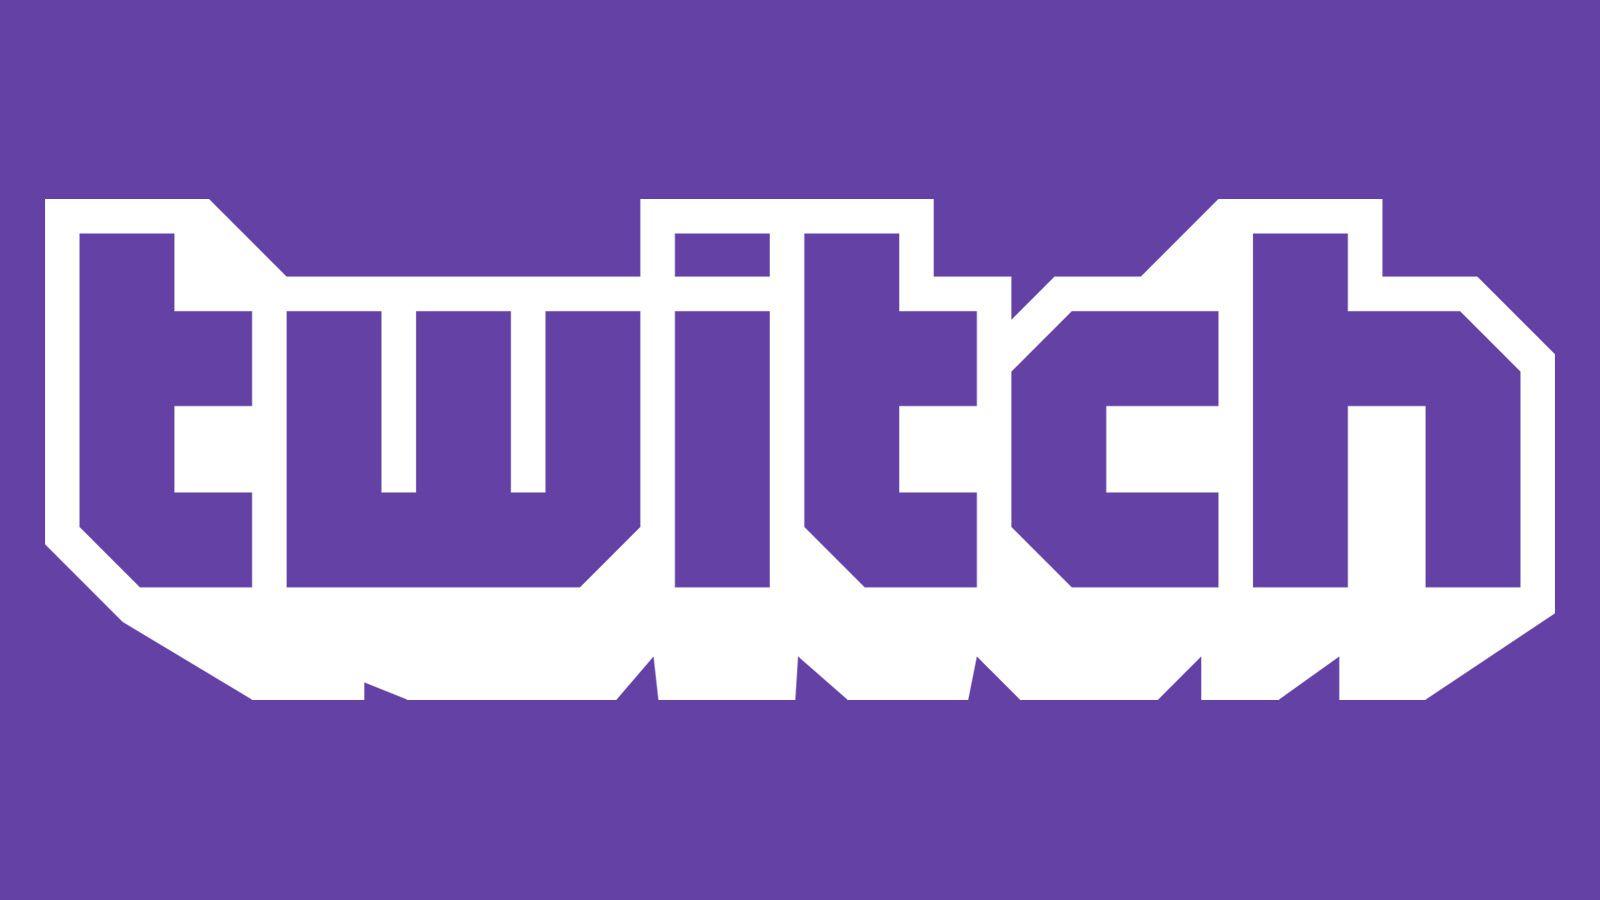 twitch_logo_purple.0.jpg